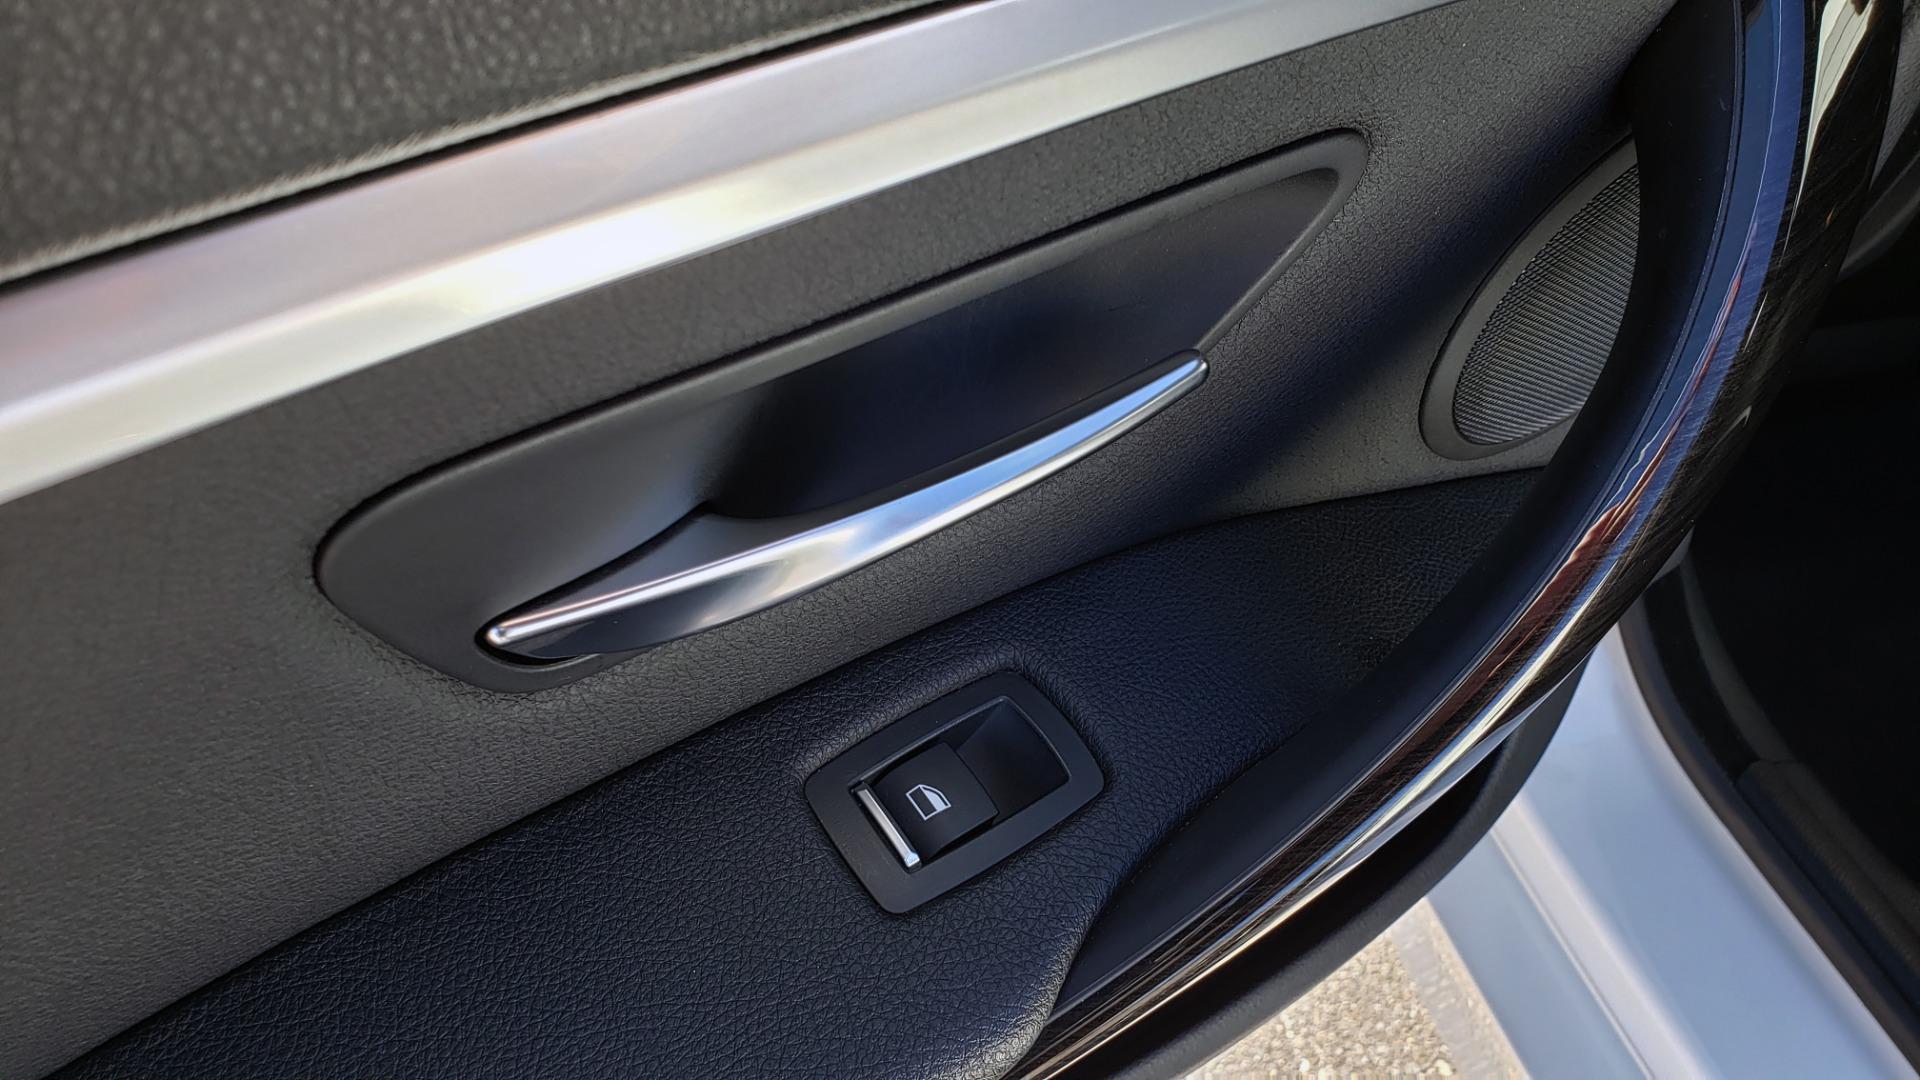 Used 2018 BMW 4 SERIES 430IXDRIVE / PREMIUM / NAV / SUNROOF / ESSENTIALS PKG for sale $28,995 at Formula Imports in Charlotte NC 28227 62